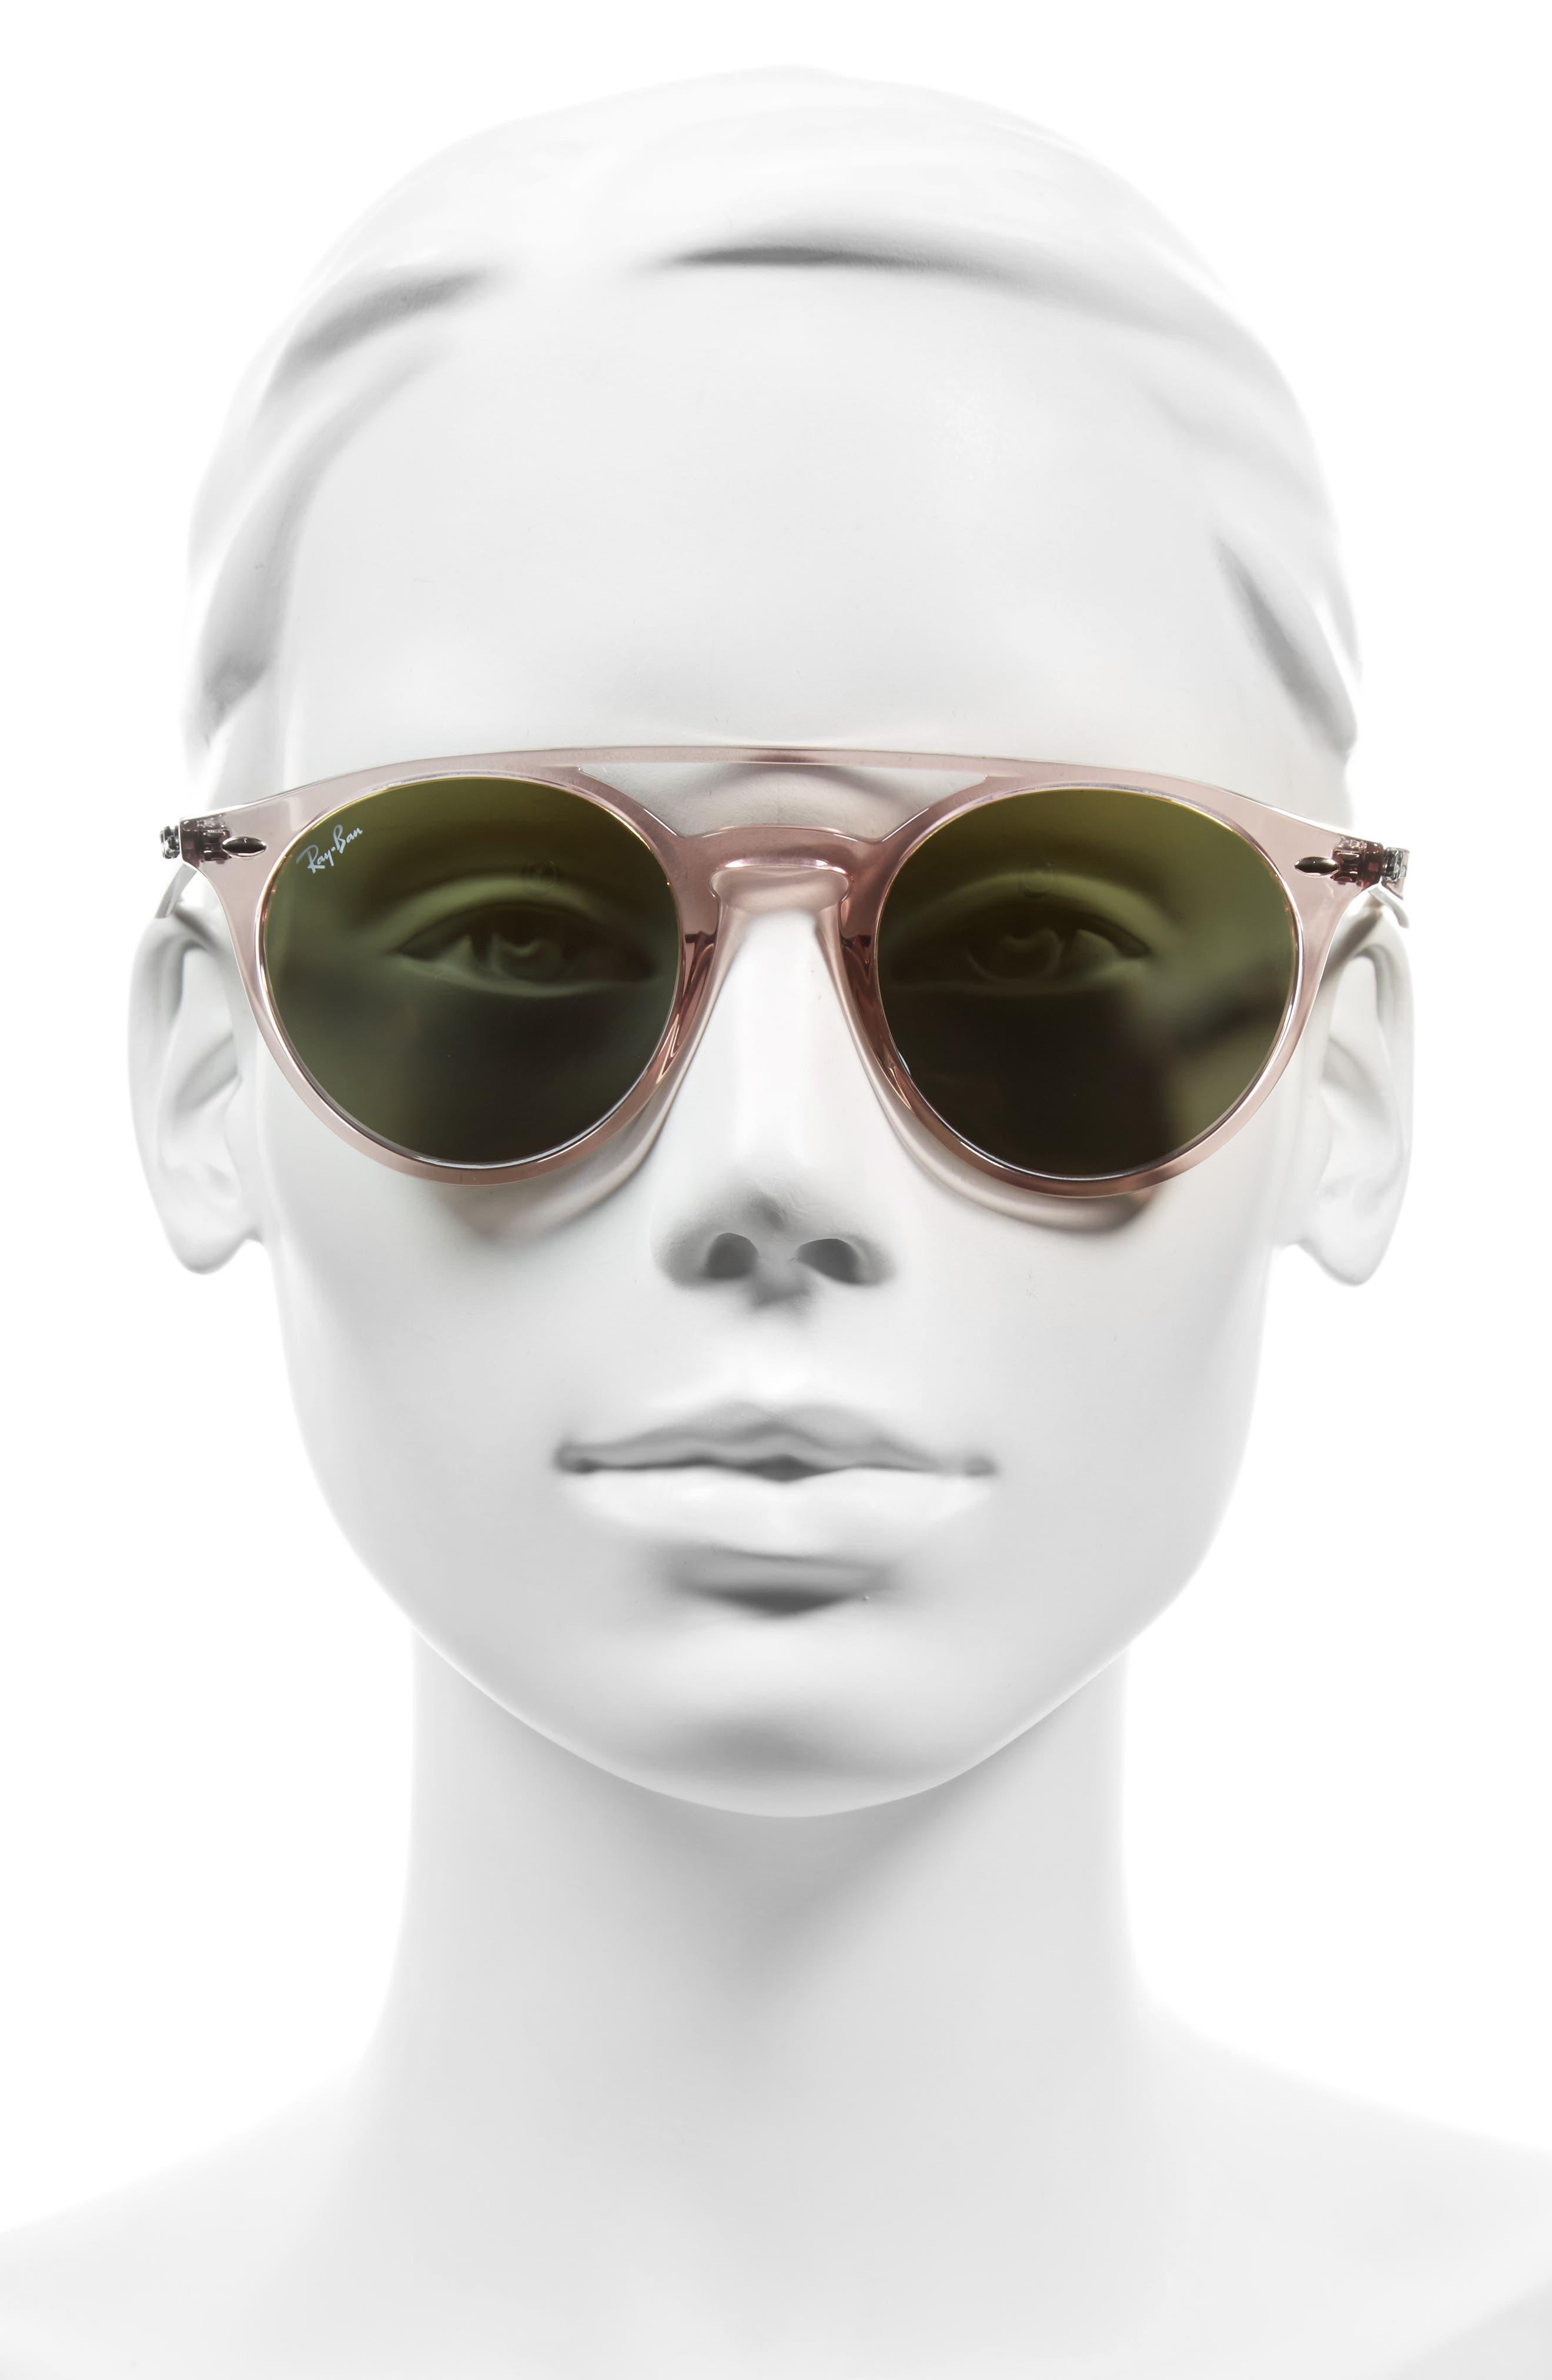 51mm Mirrored Rainbow Sunglasses,                             Alternate thumbnail 2, color,                             Pink Rainbow